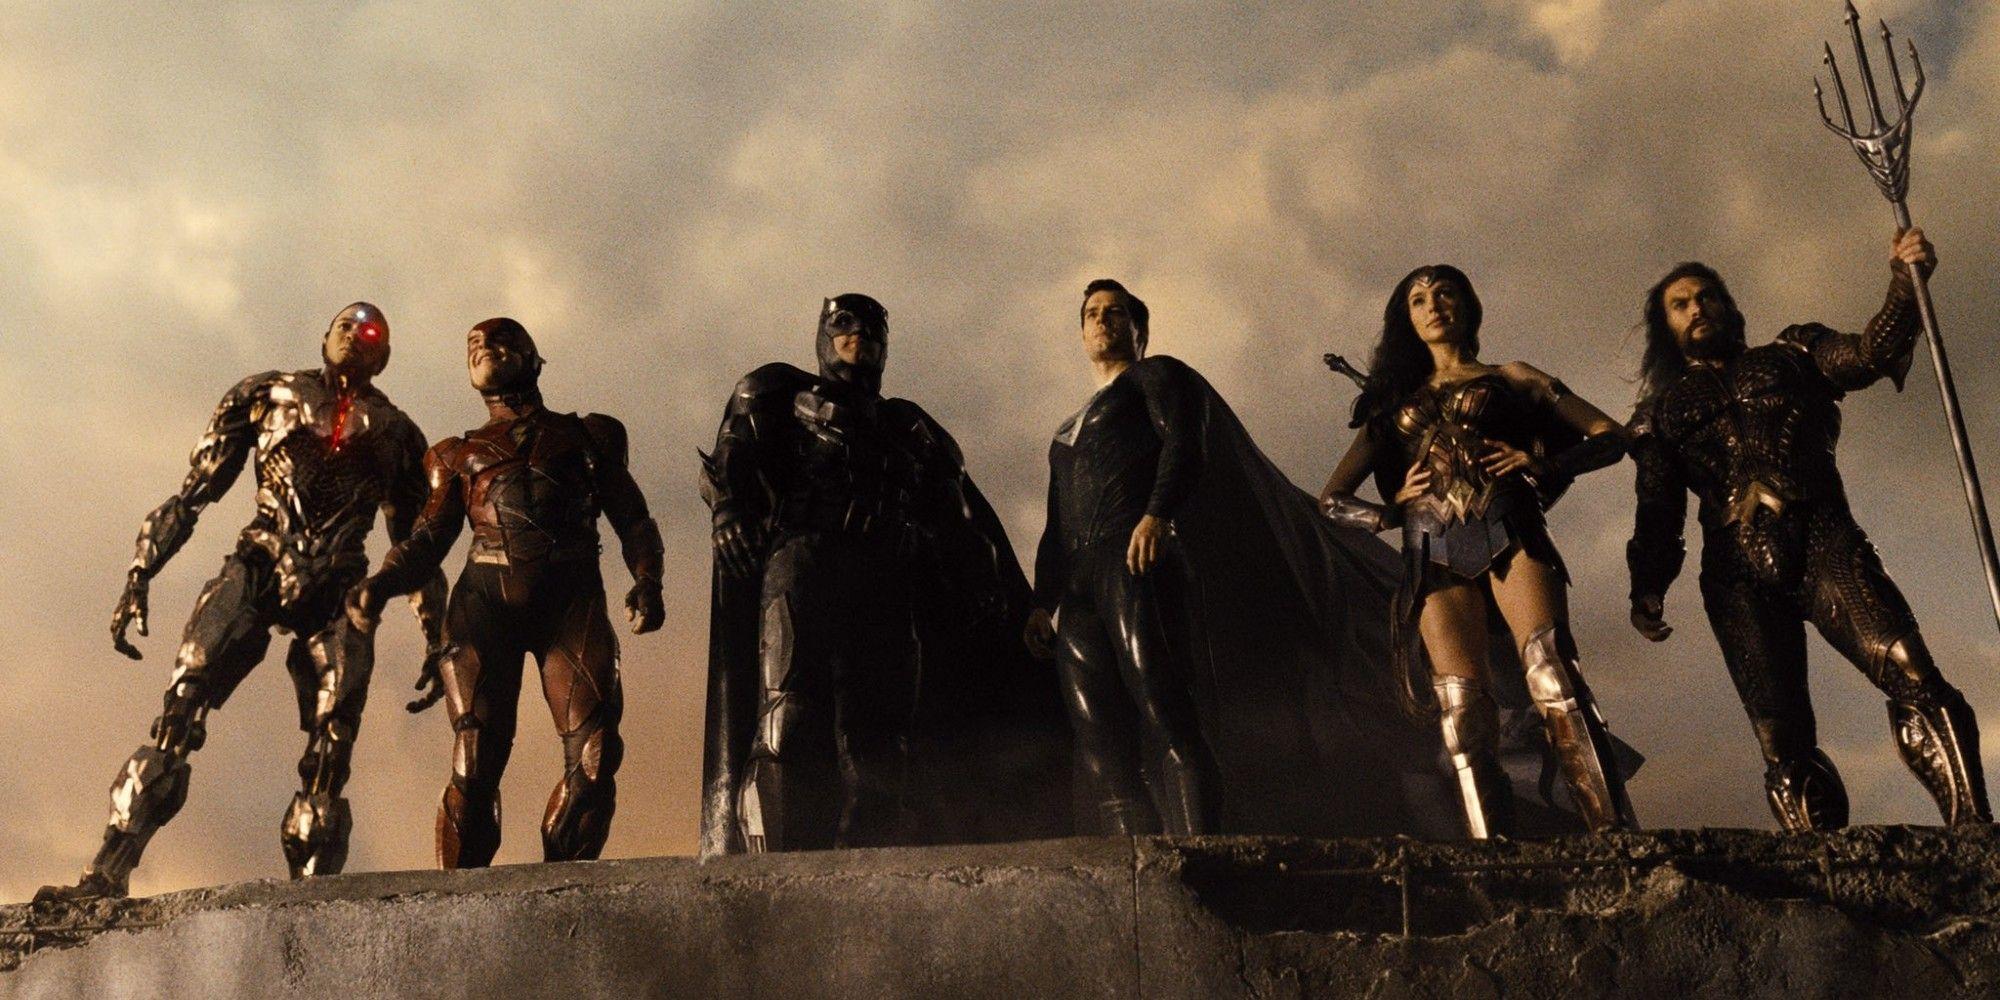 Ray Fisher Ezra Miller Ben Affleck Henry Cavill Gal Gadot Jason Momoa | Zack Snyder's Justice League HBO